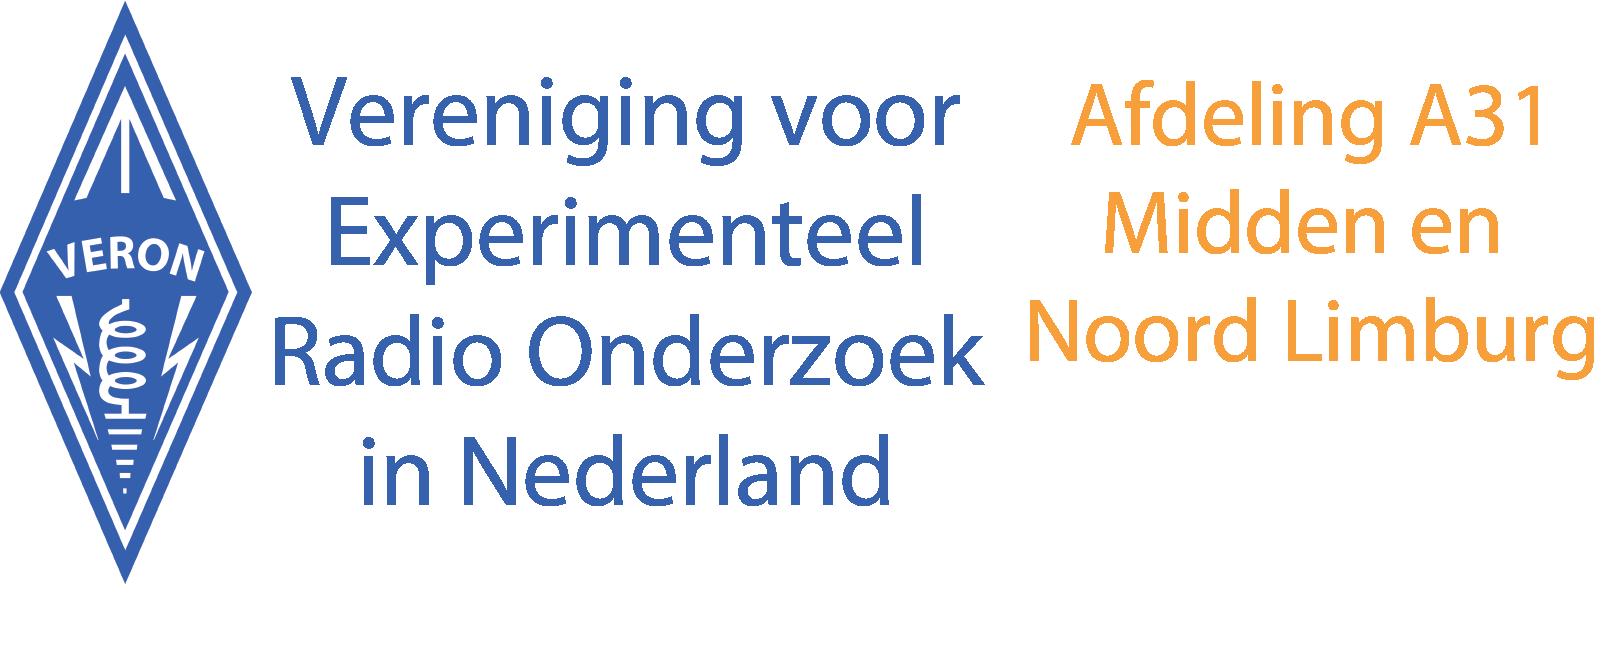 VERON a31 - Midden en Noord Limburg